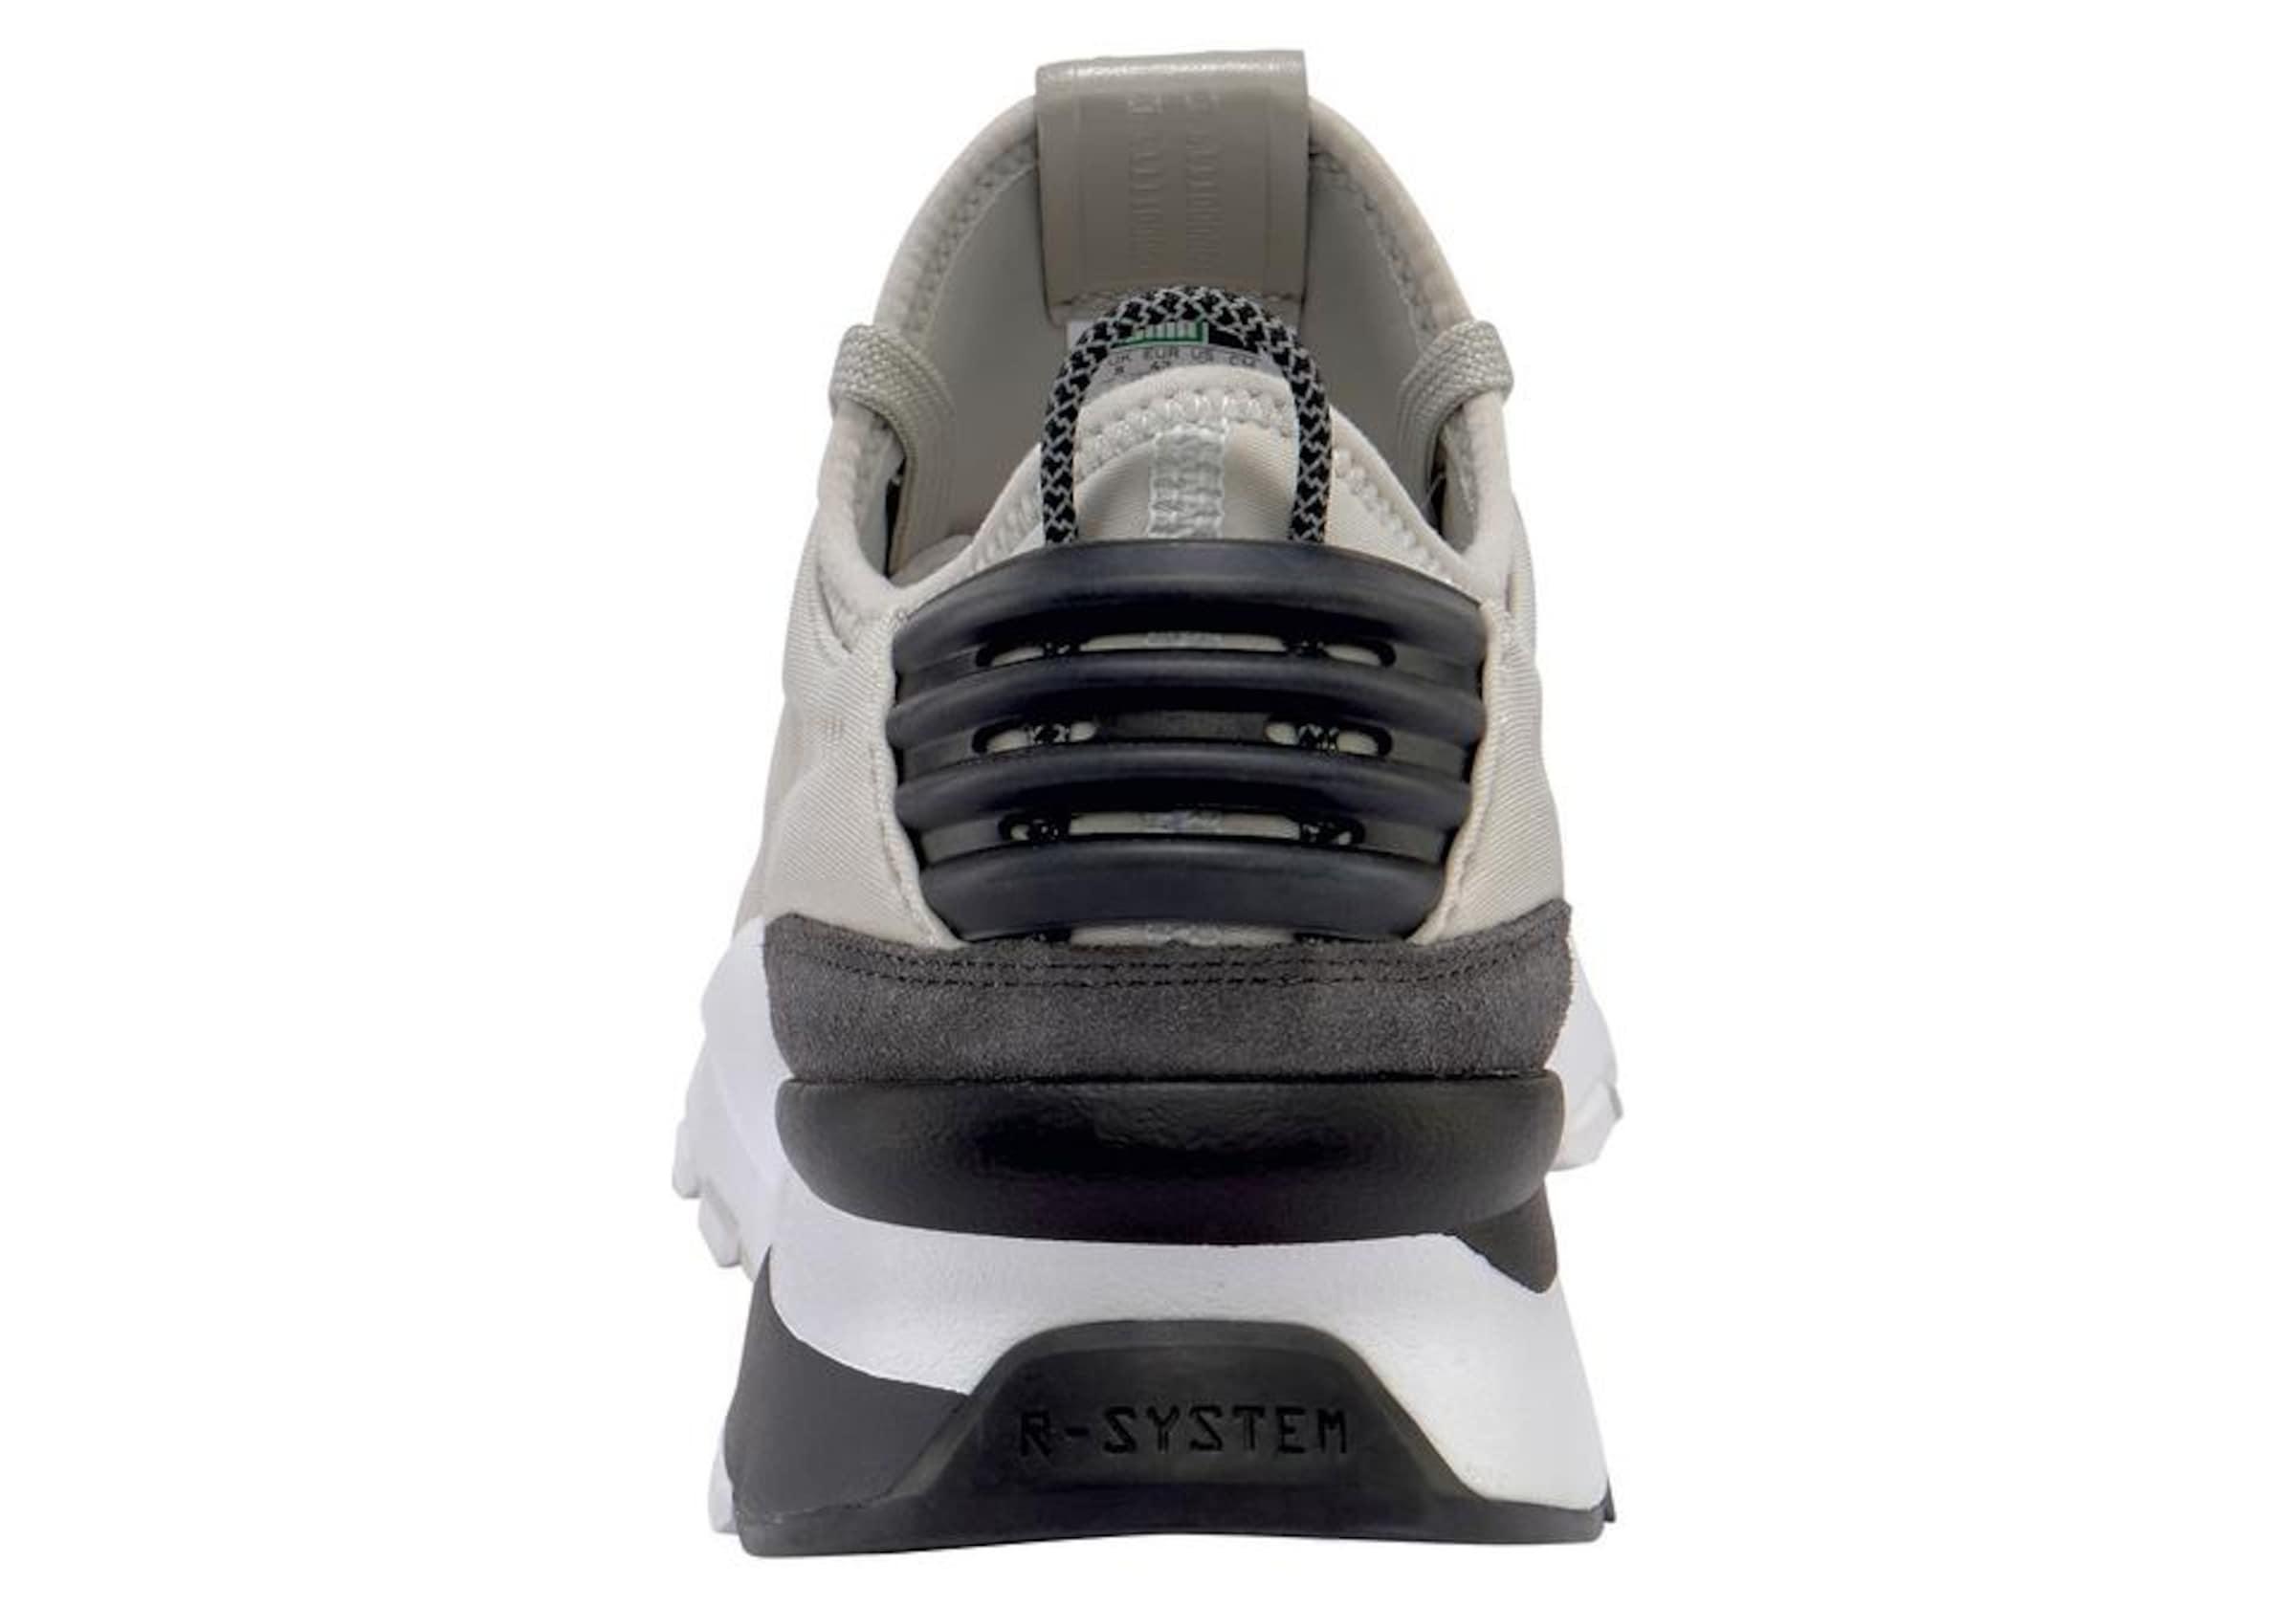 Puma 'rs BasaltgrauGreige Weiß Core' In Sneaker o 5RL3qcA4j